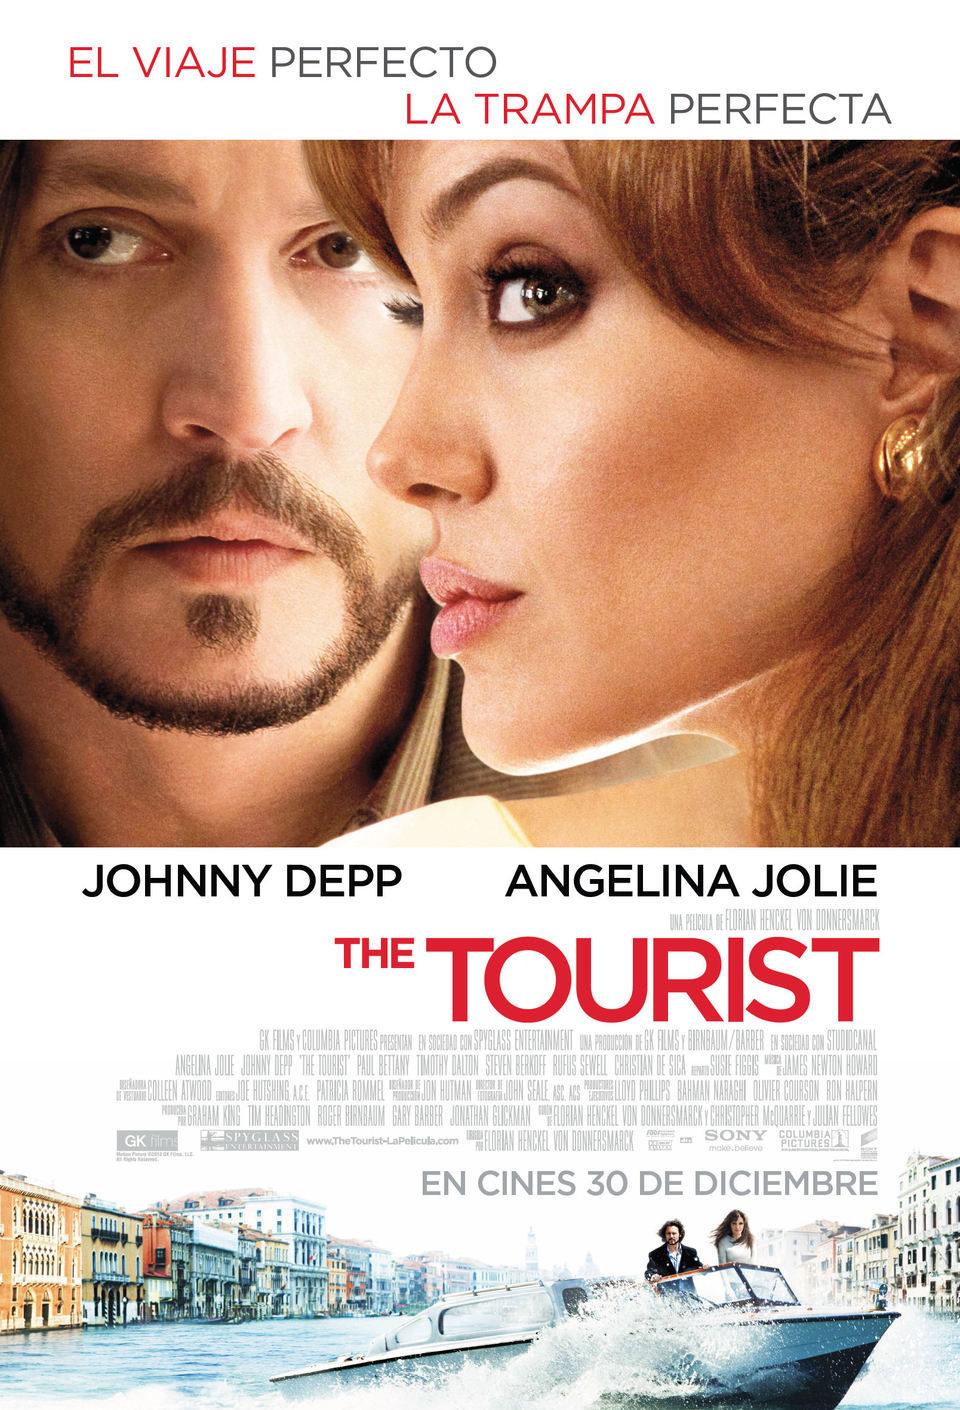 España poster for The Tourist